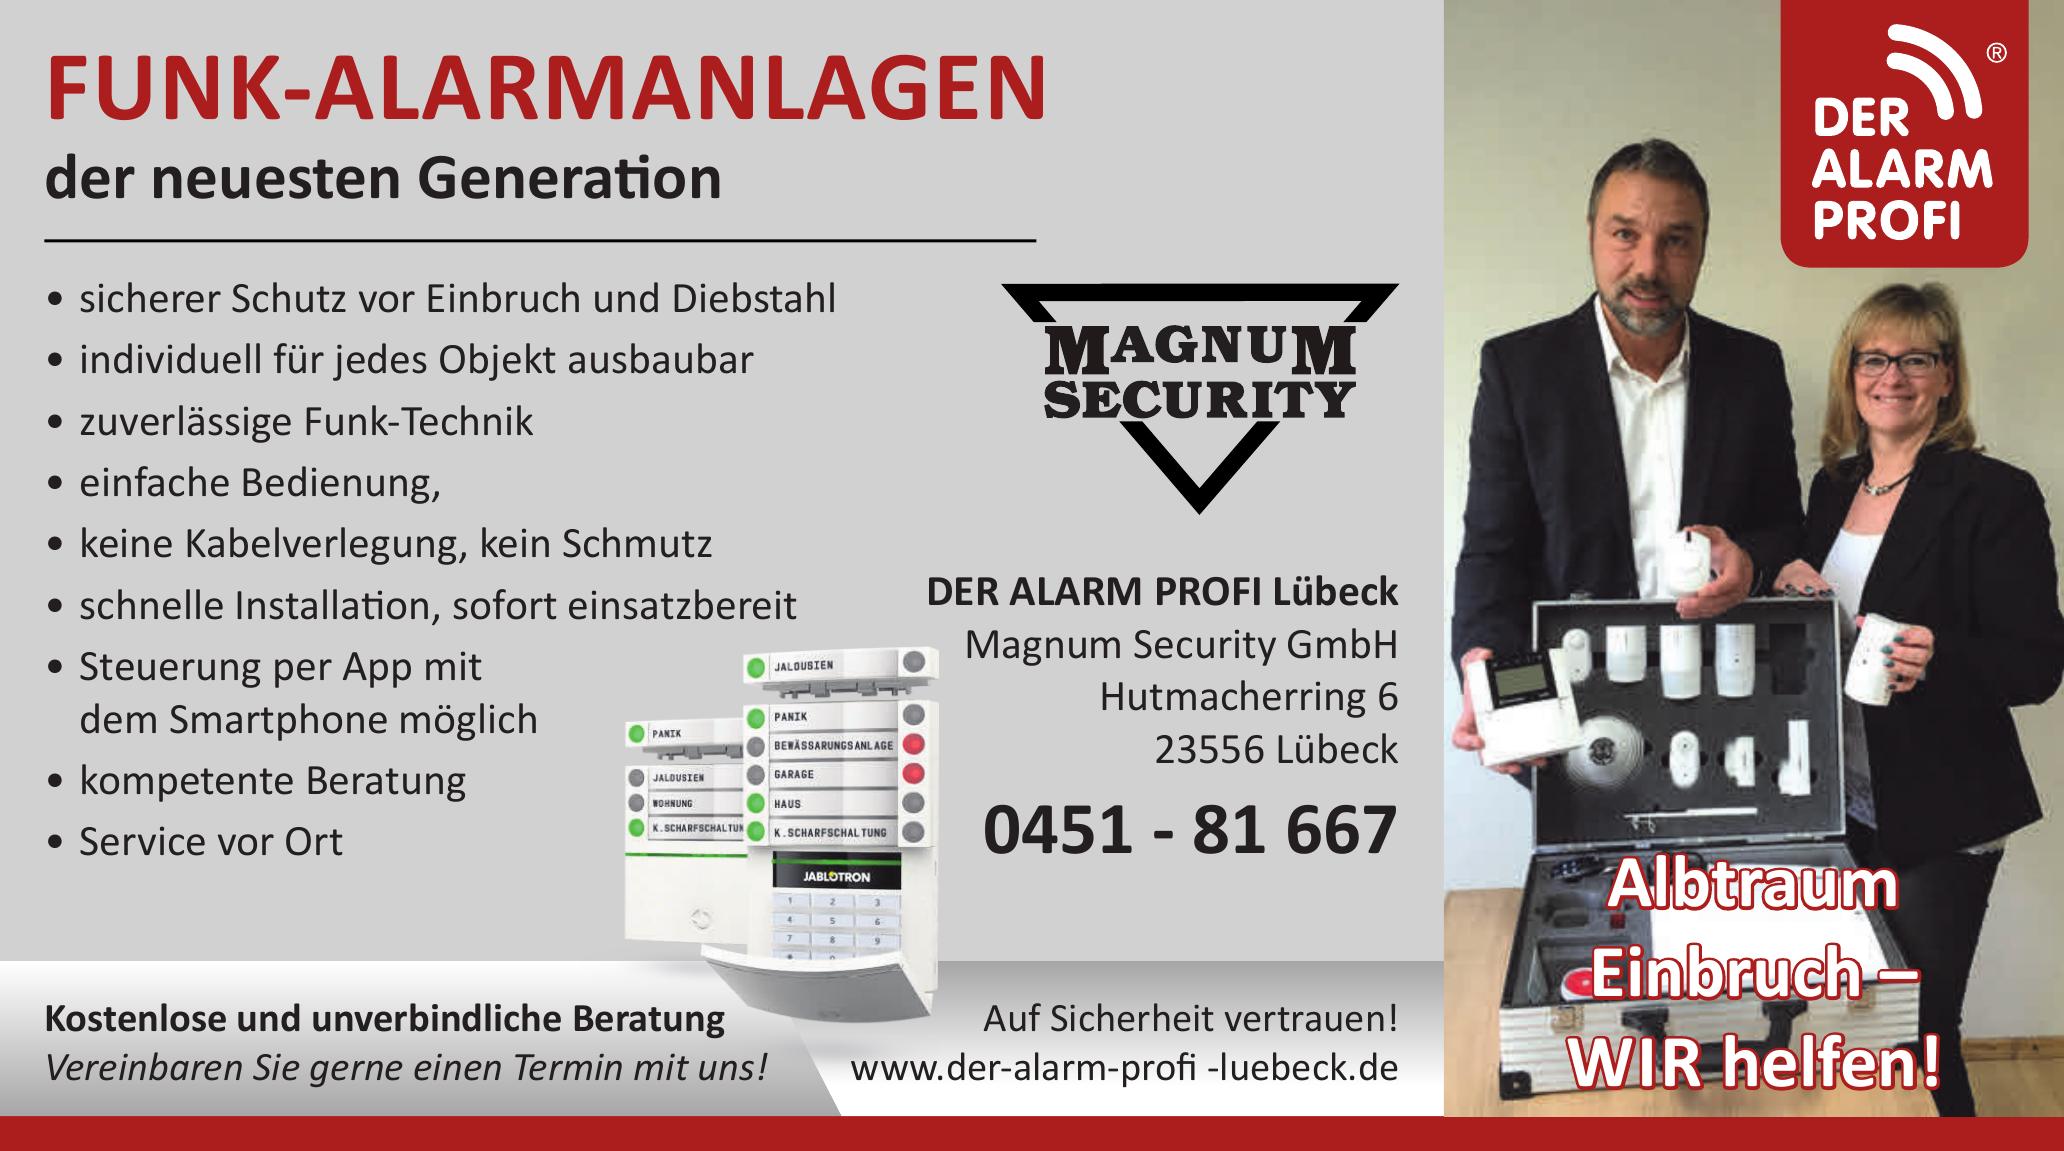 Der Alarm Profi Lübeck Magnum Security GmbH